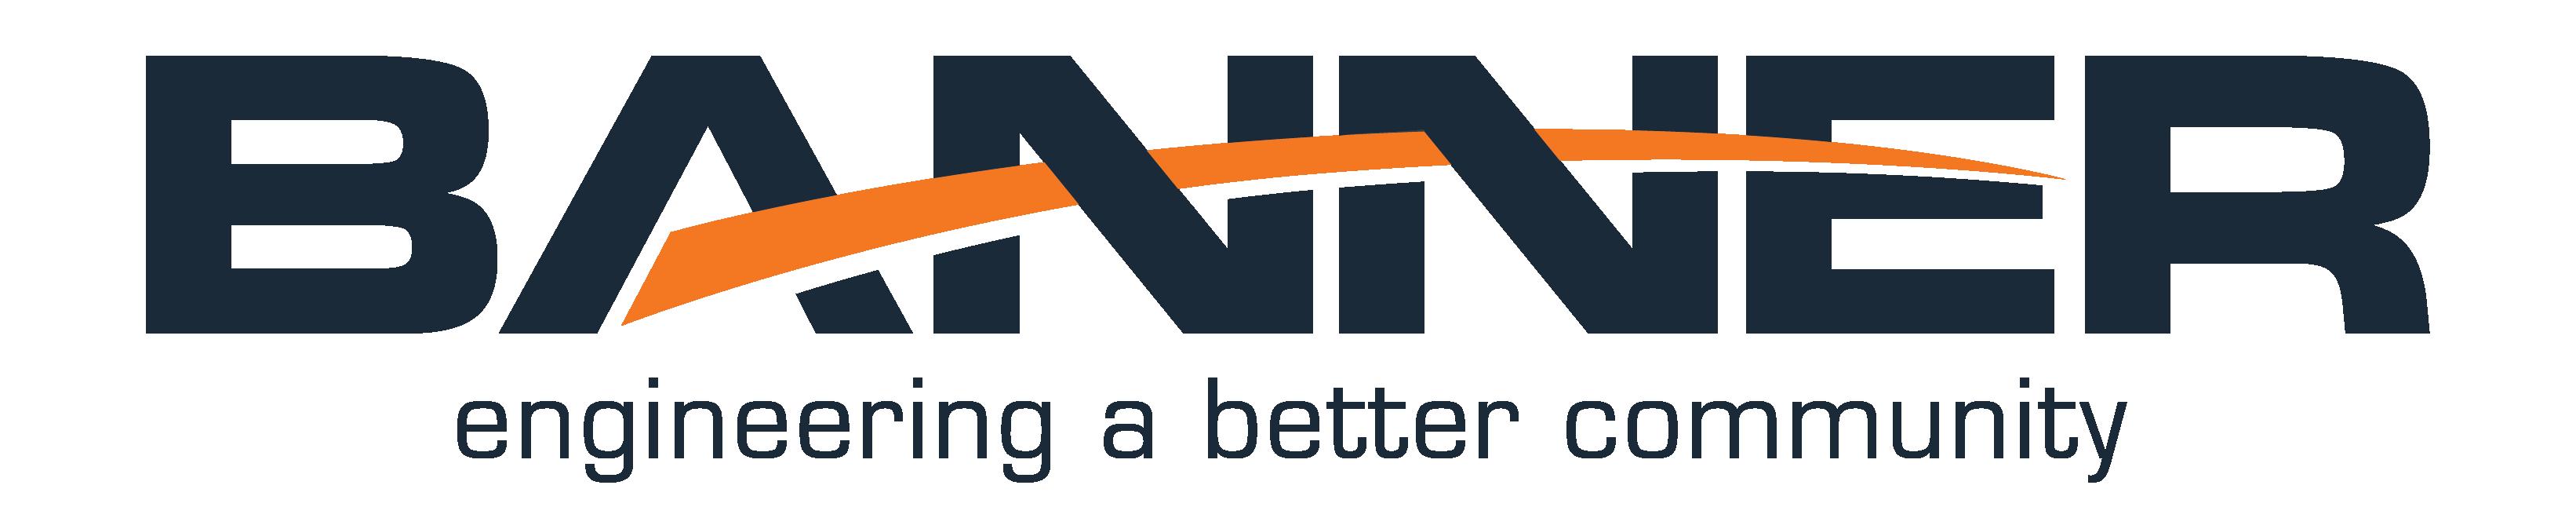 Banner_Logo_Color_NEW-01.png